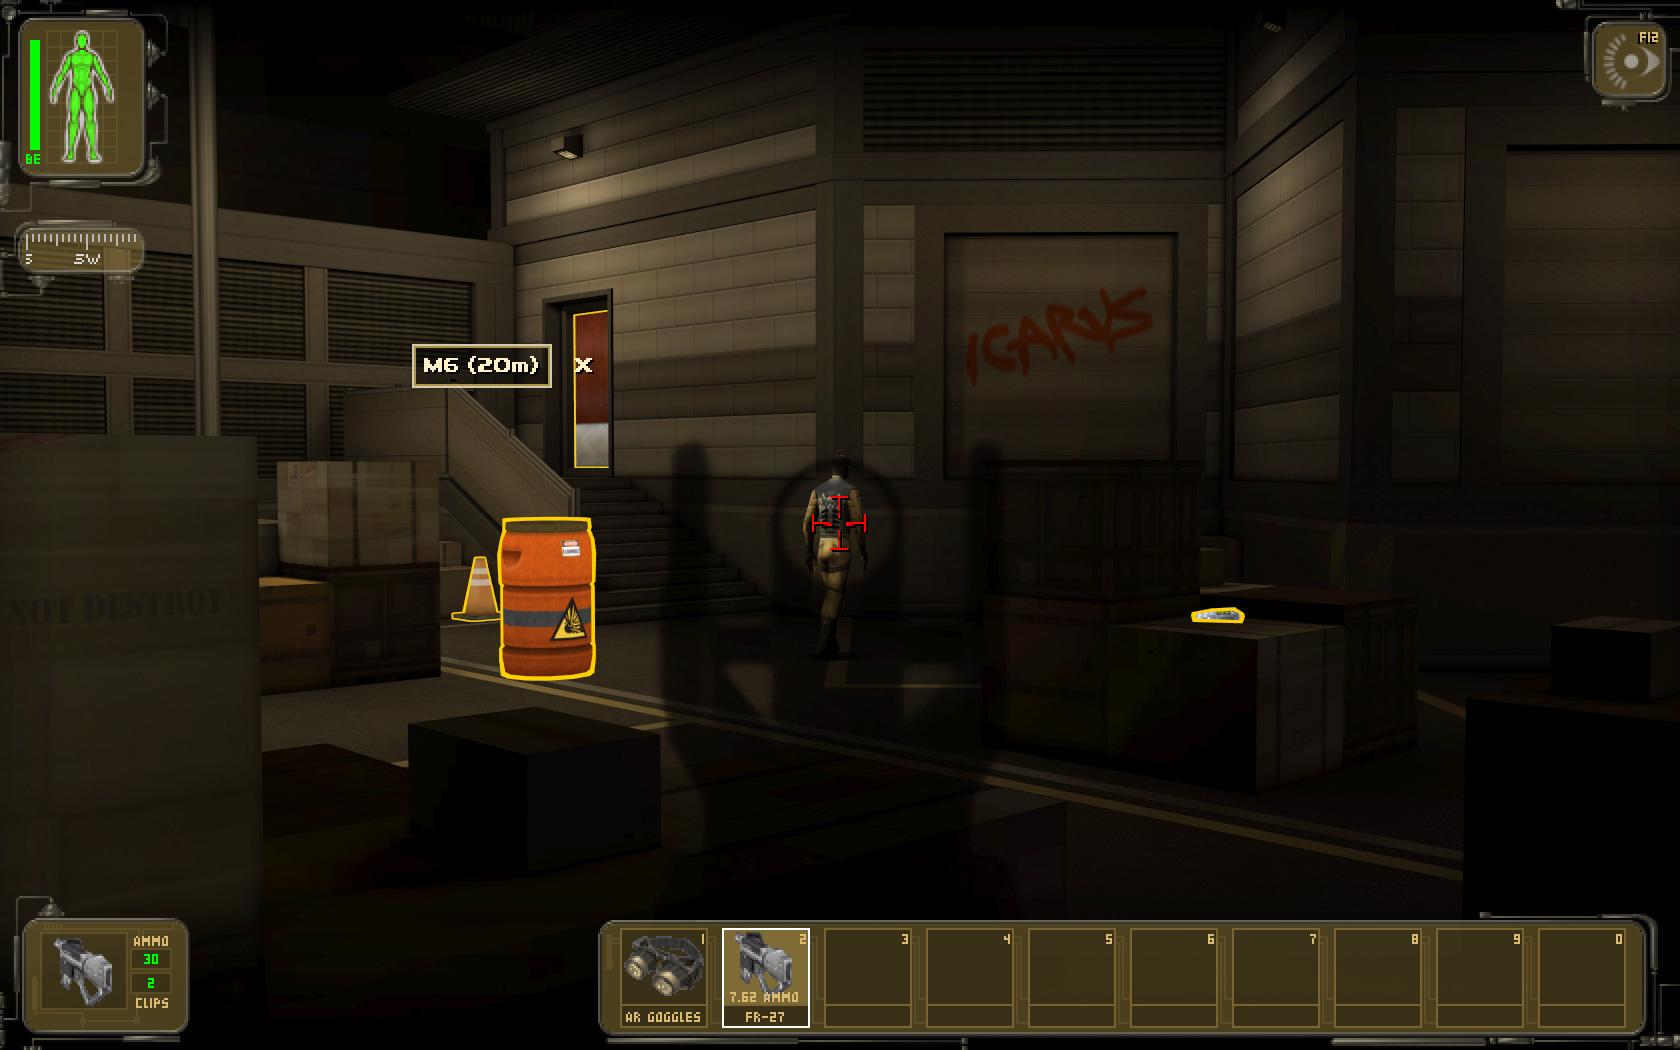 Deus ex game nude patches smut clip